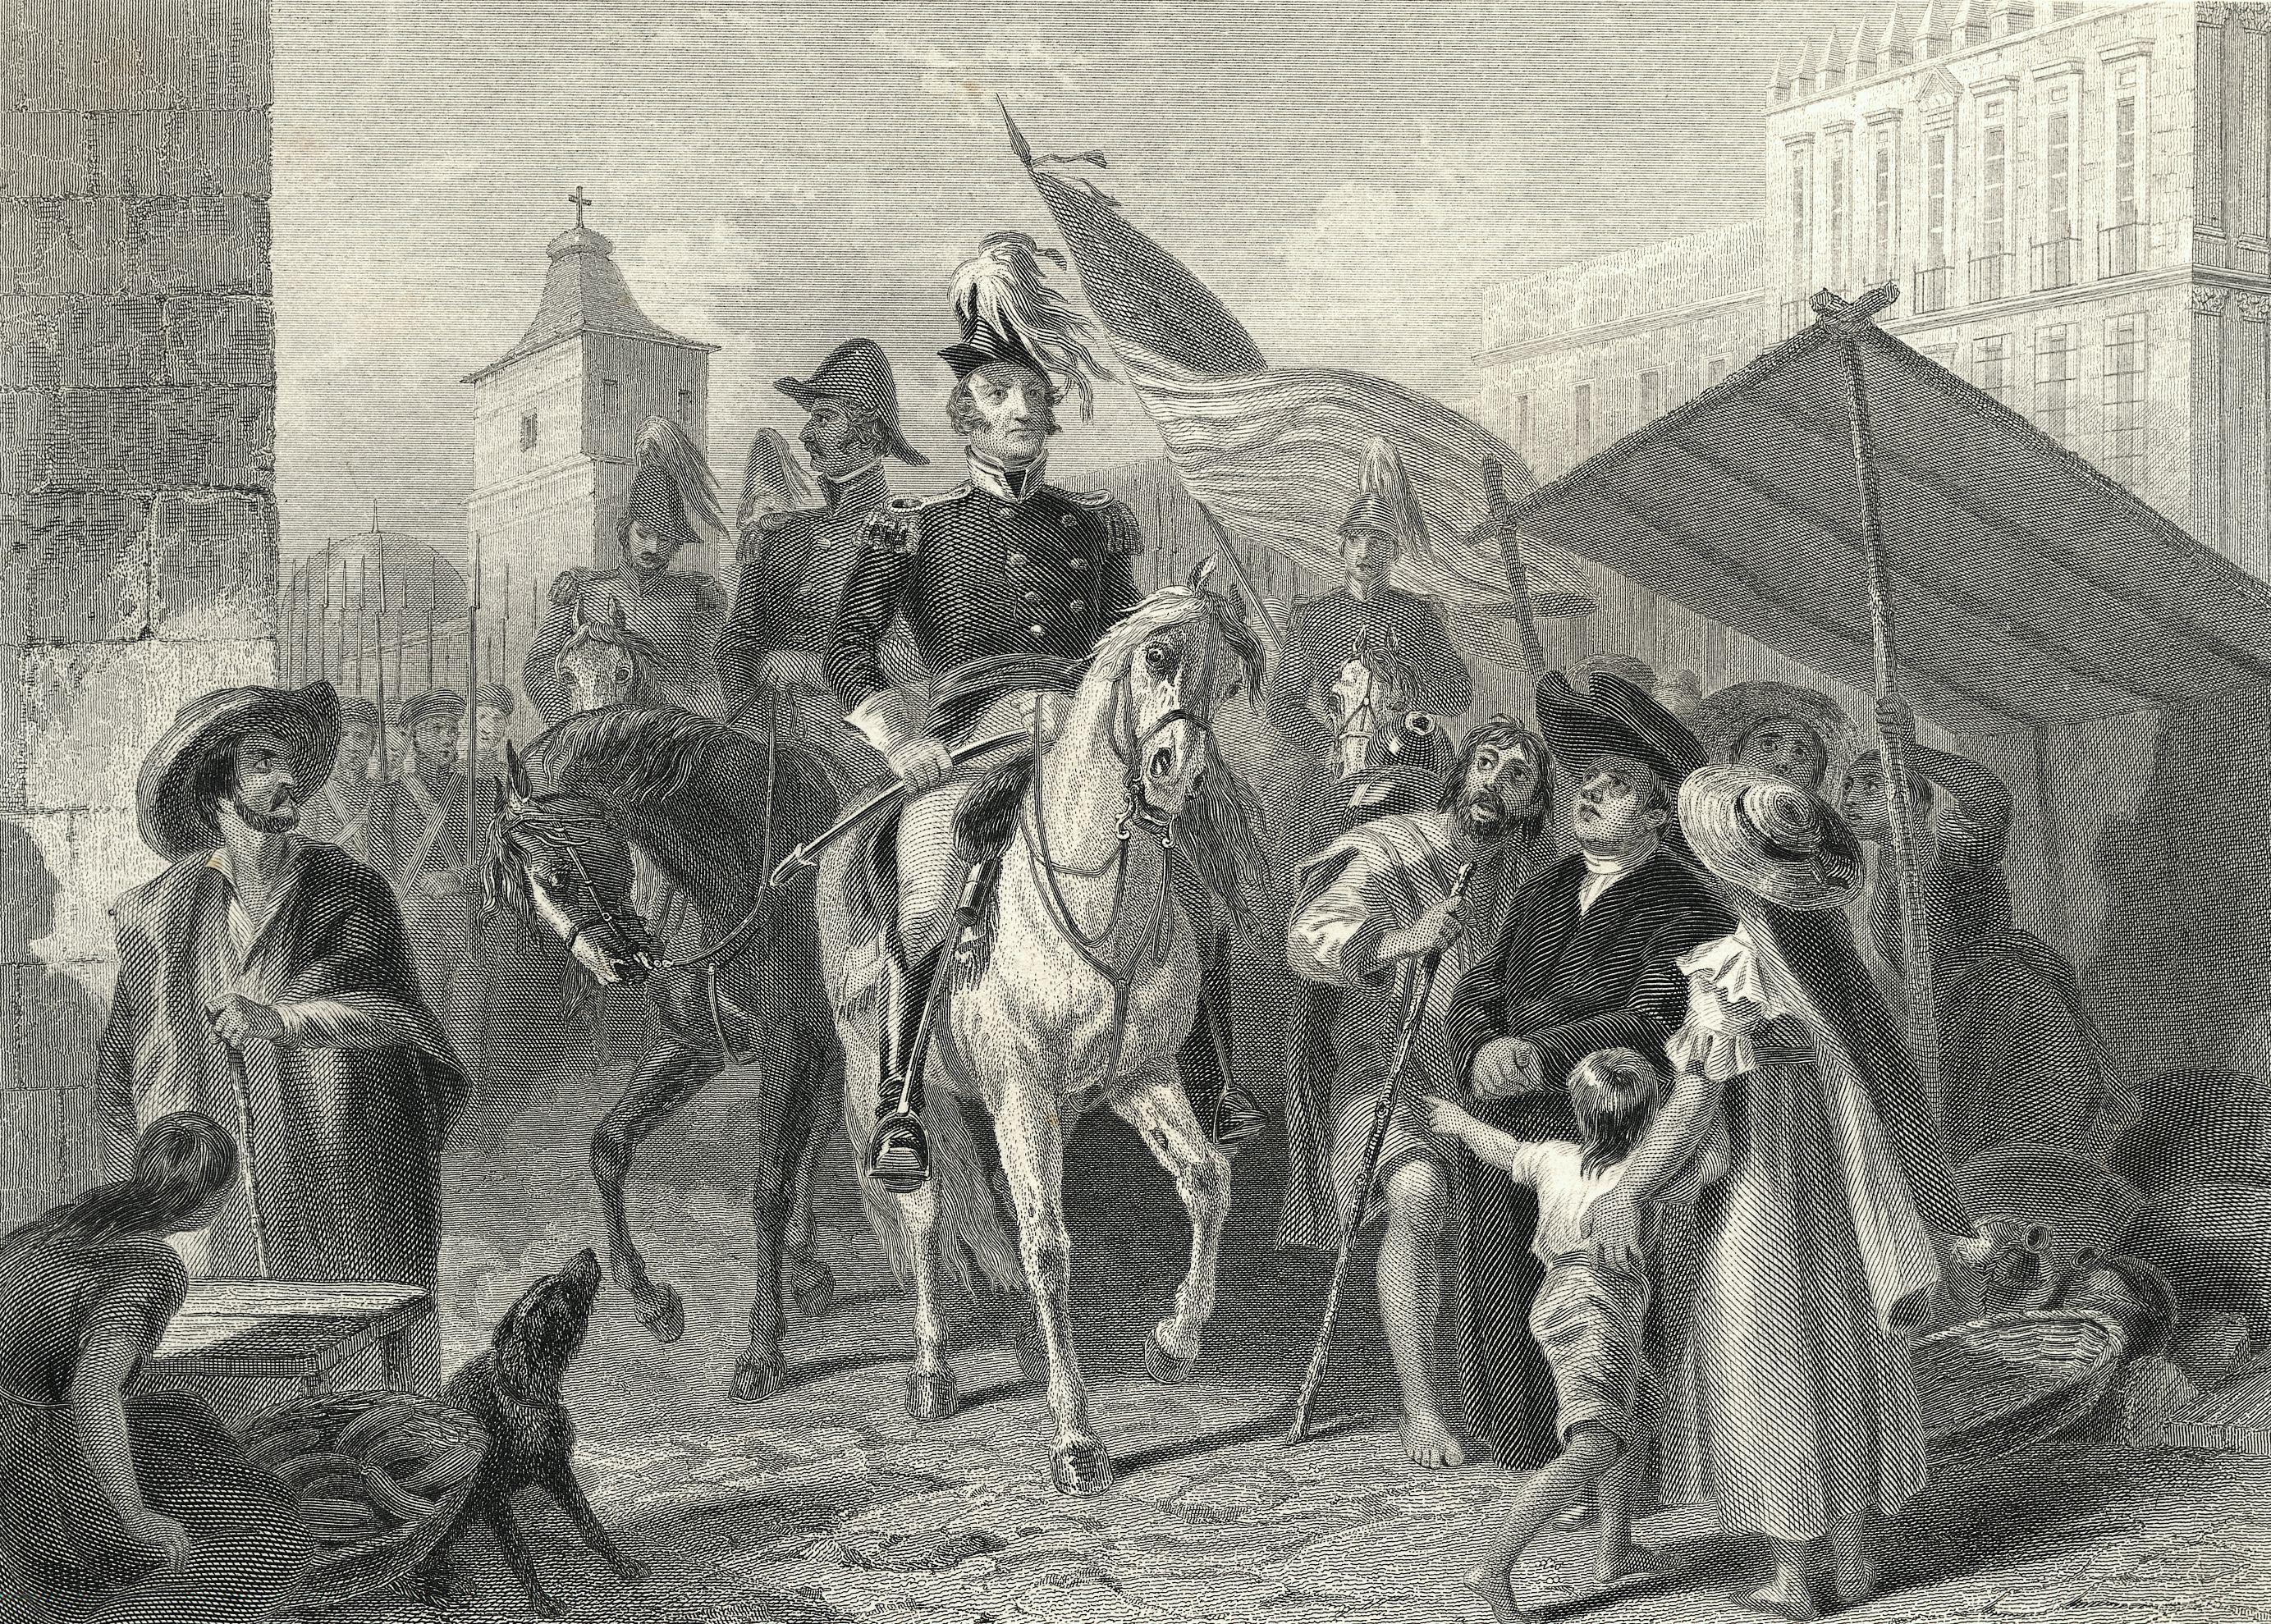 General Winfield Scott Entering Mexico